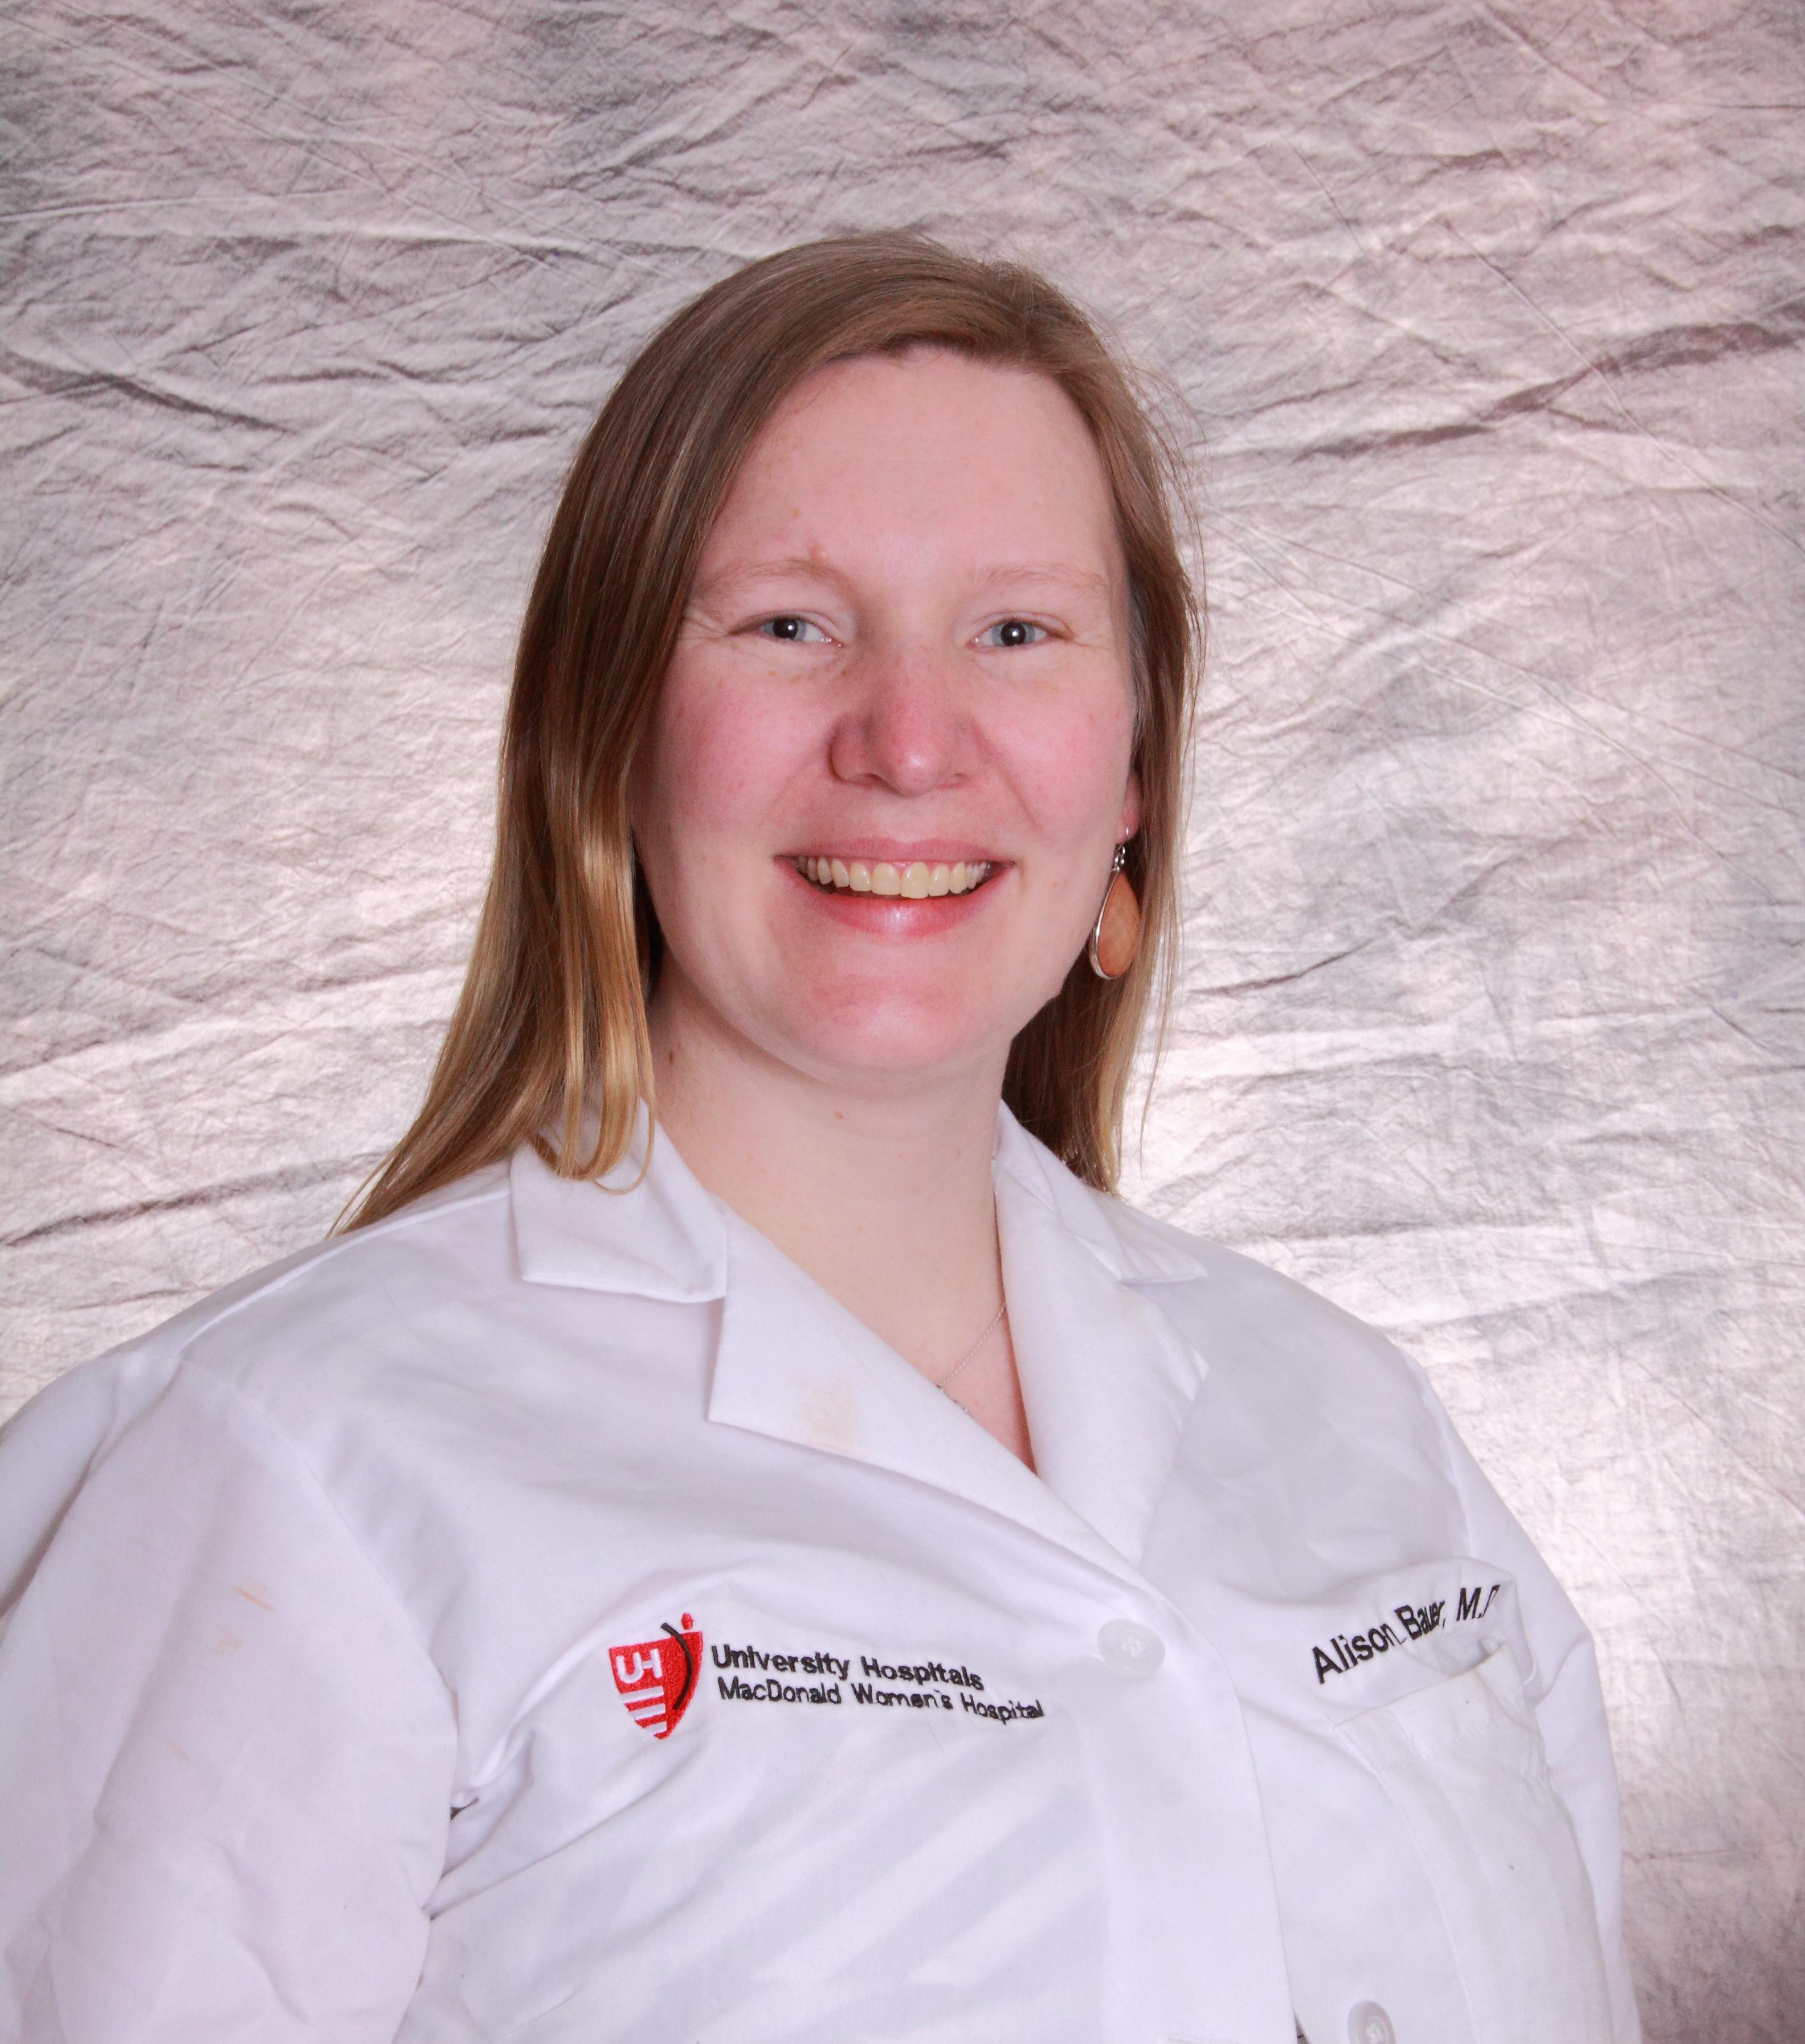 Alison Bauer, MD